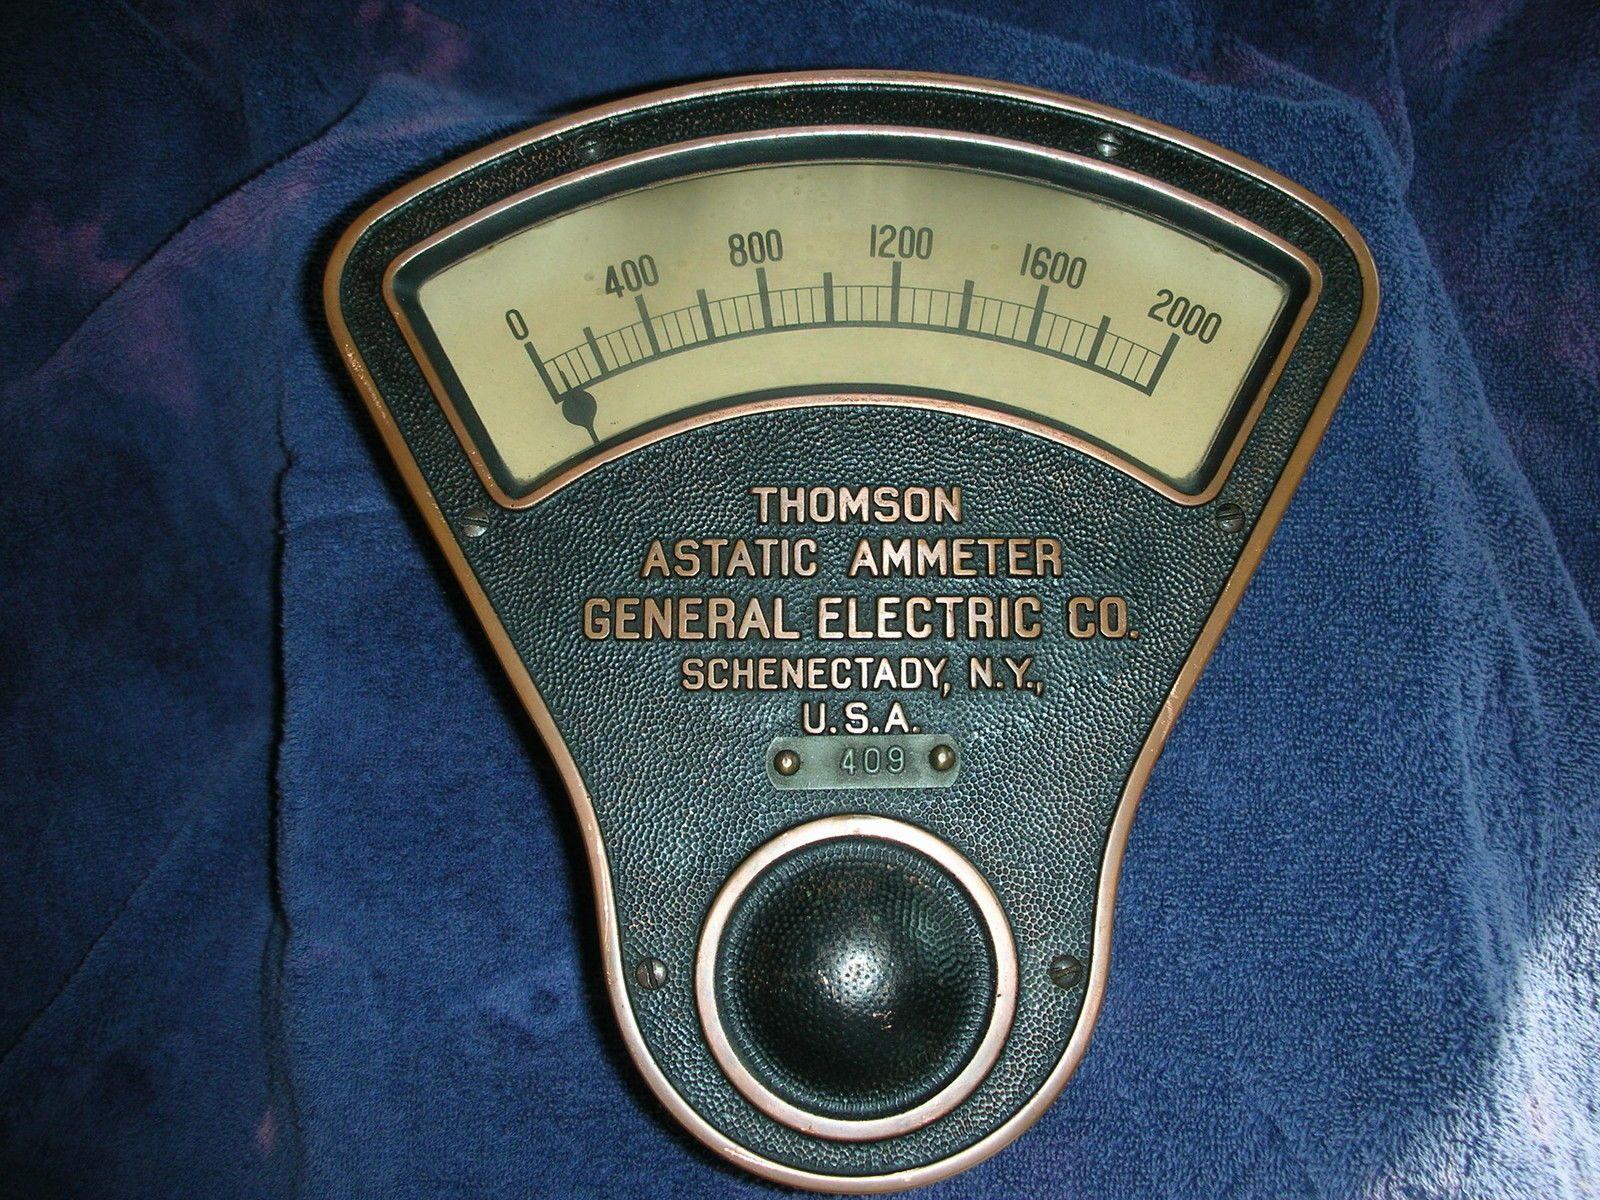 Antique Thomson Astatic Ammeter General Electric Co General Electric Electric Co Antiques